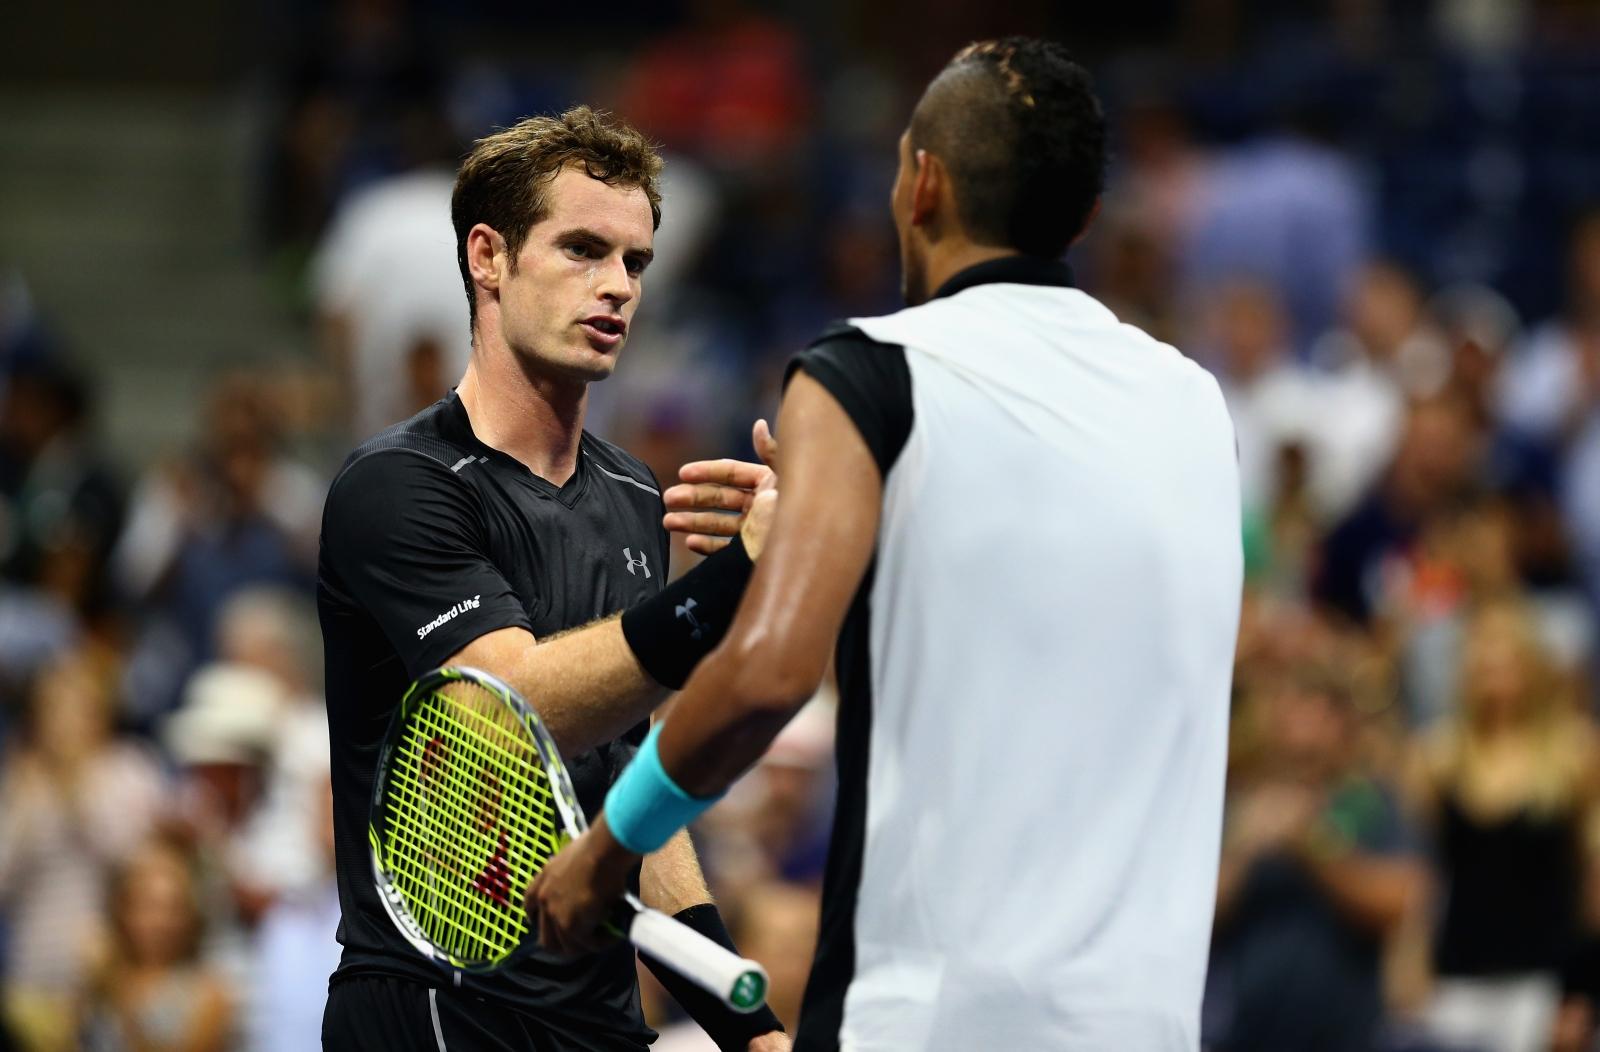 Andy Murray Nick Kyrgios US Open 2015